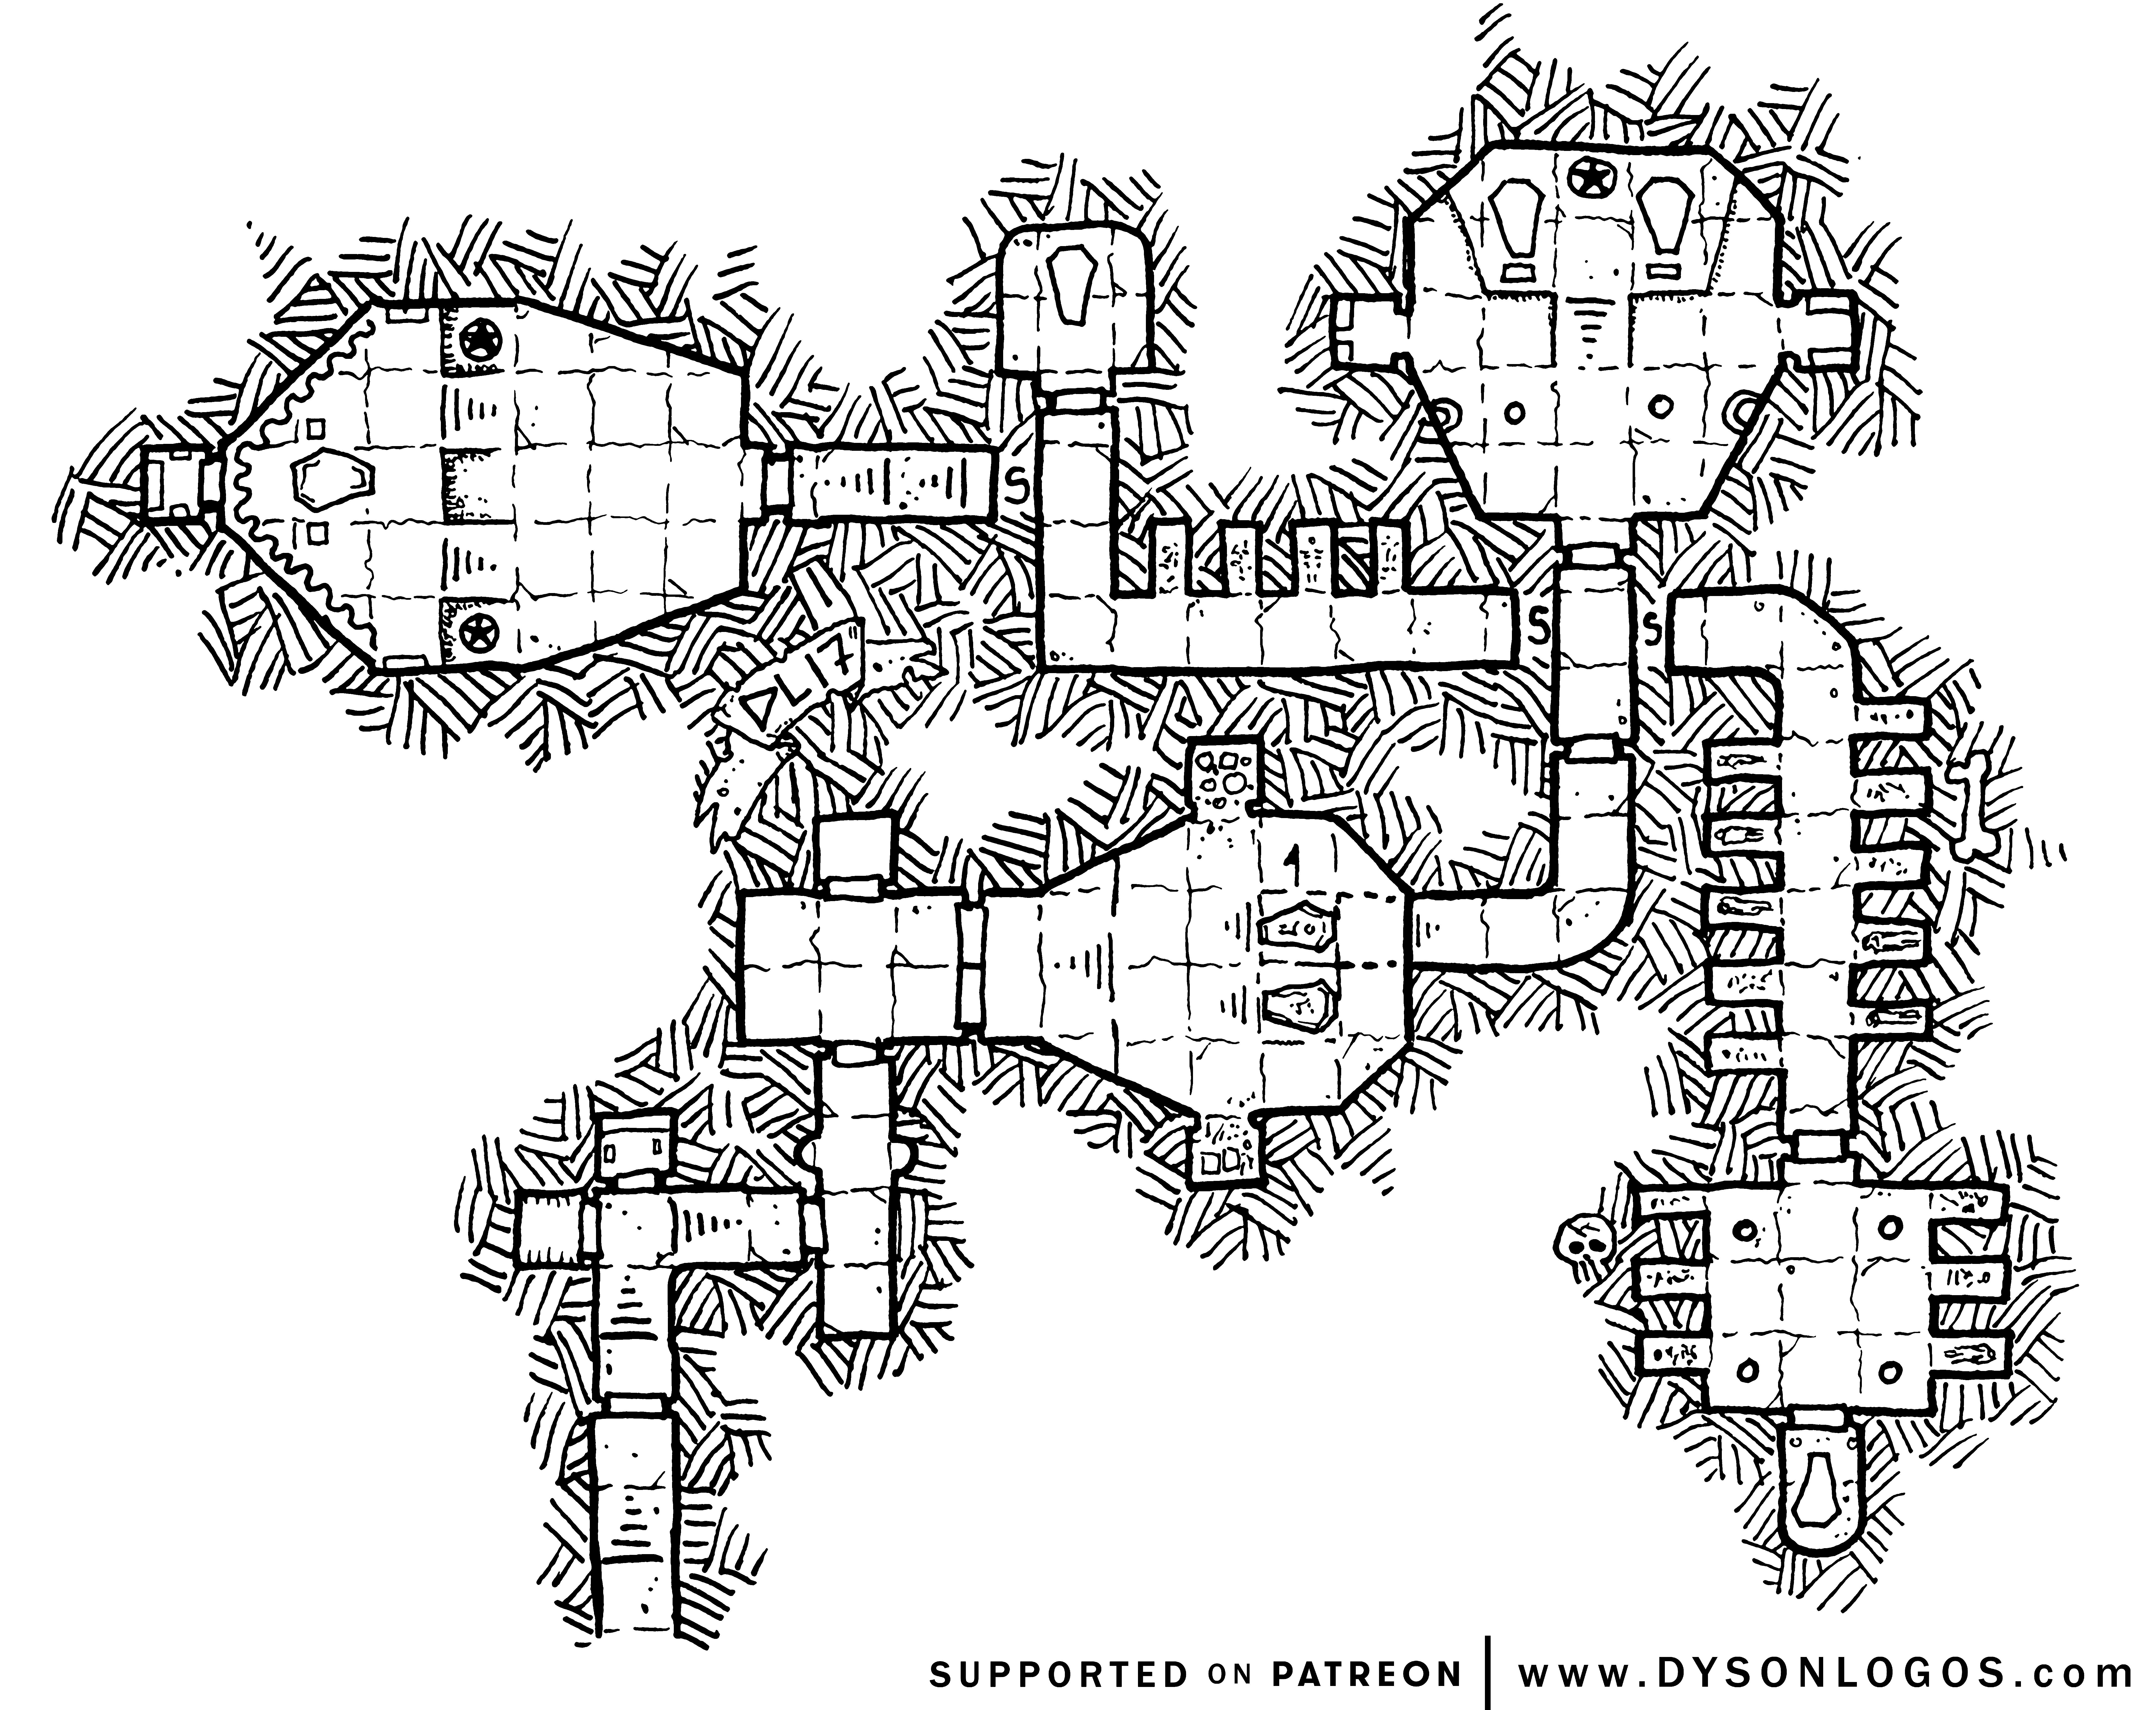 The False Tombs (1200 dpi)